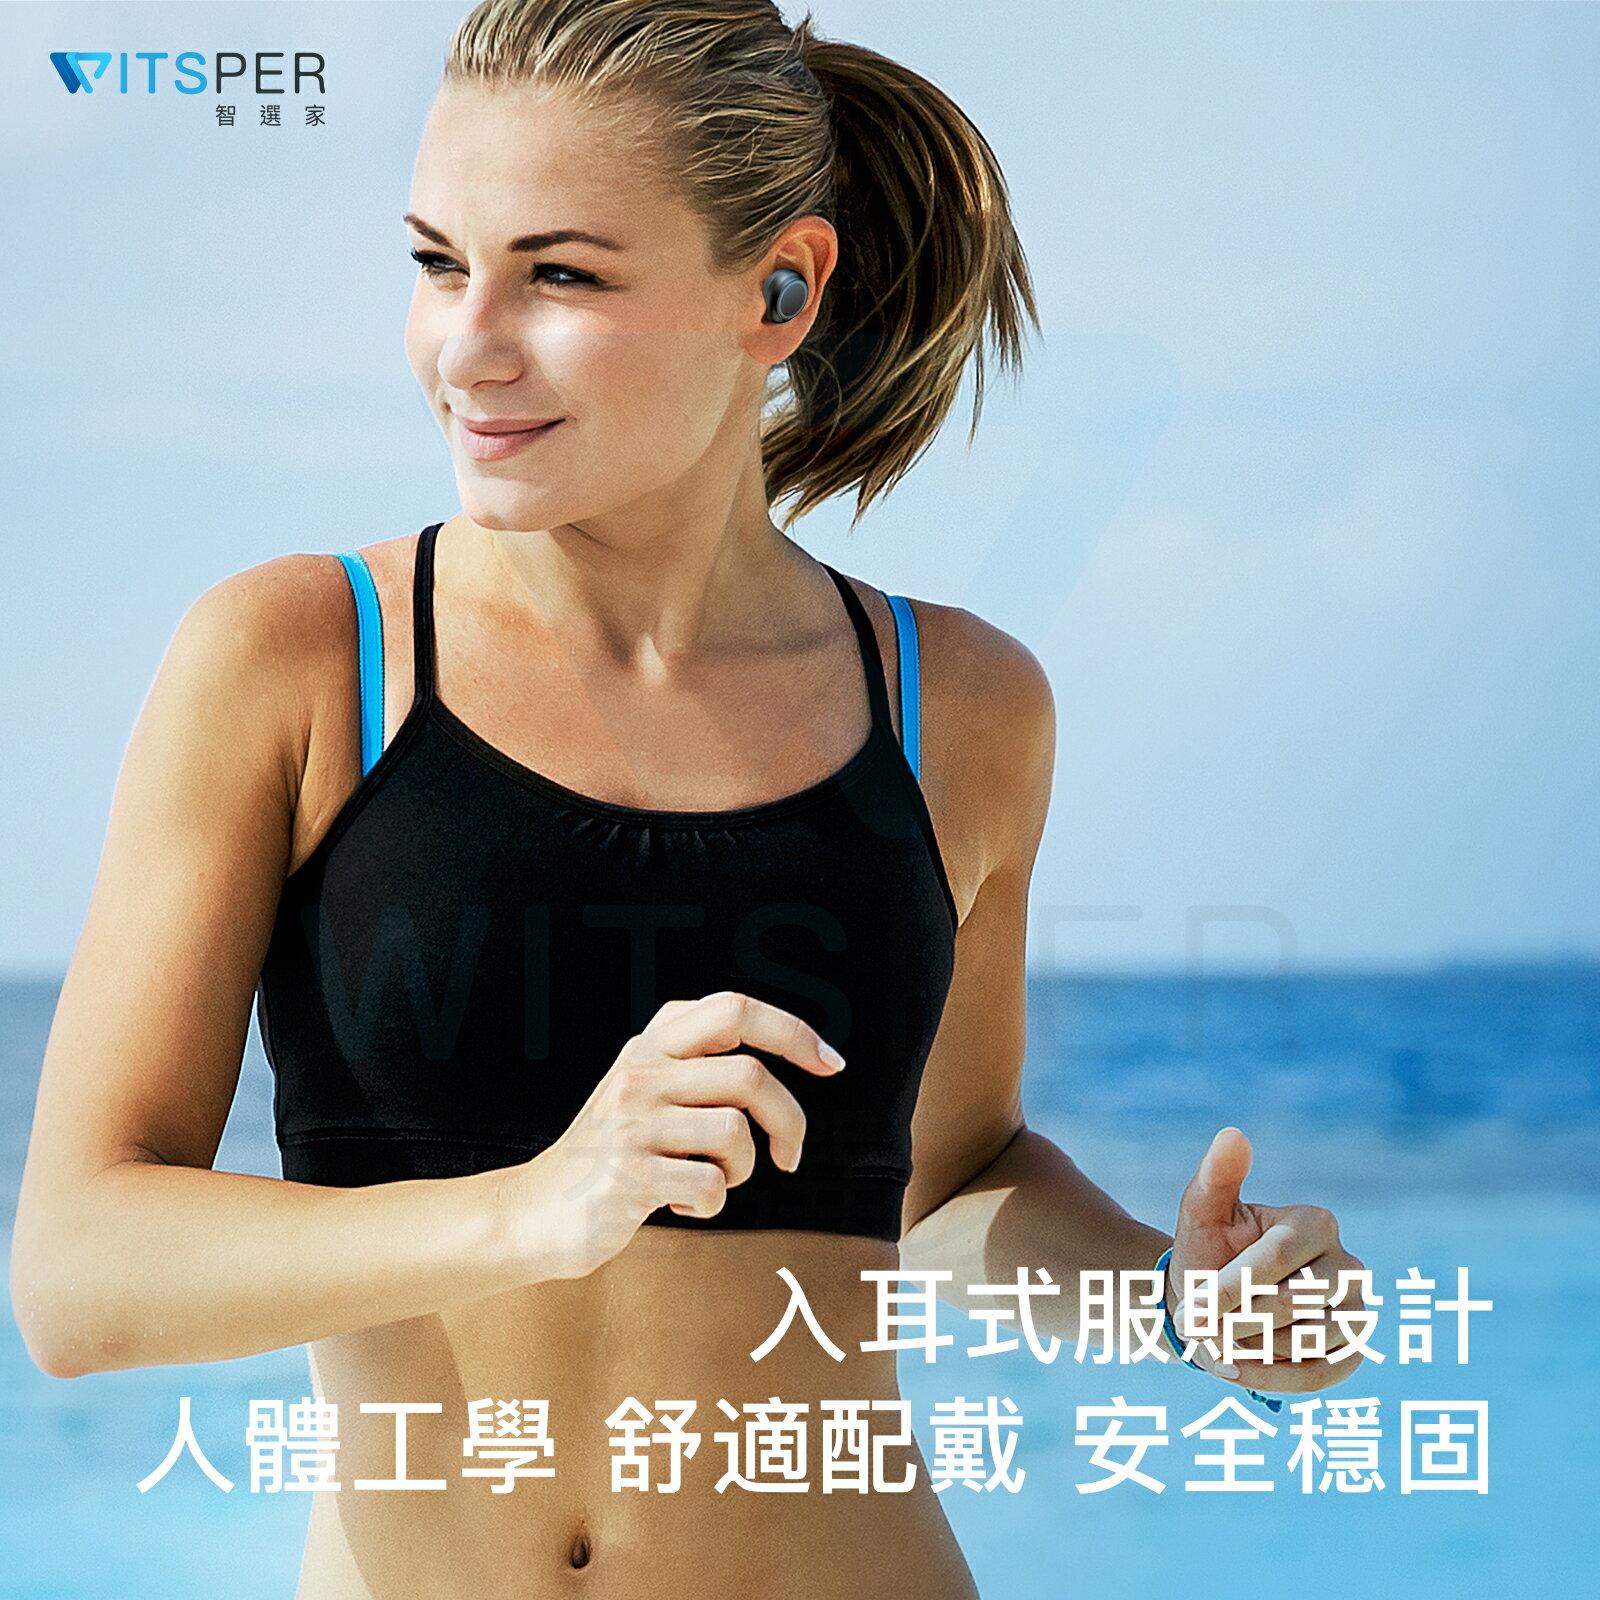 """APP領卷折100""  Taotronics TT-BH052真無線藍牙耳機  觸控耳機 tws藍牙耳機 藍牙5.0  IPX7防水 真無線推薦 CP值 9"